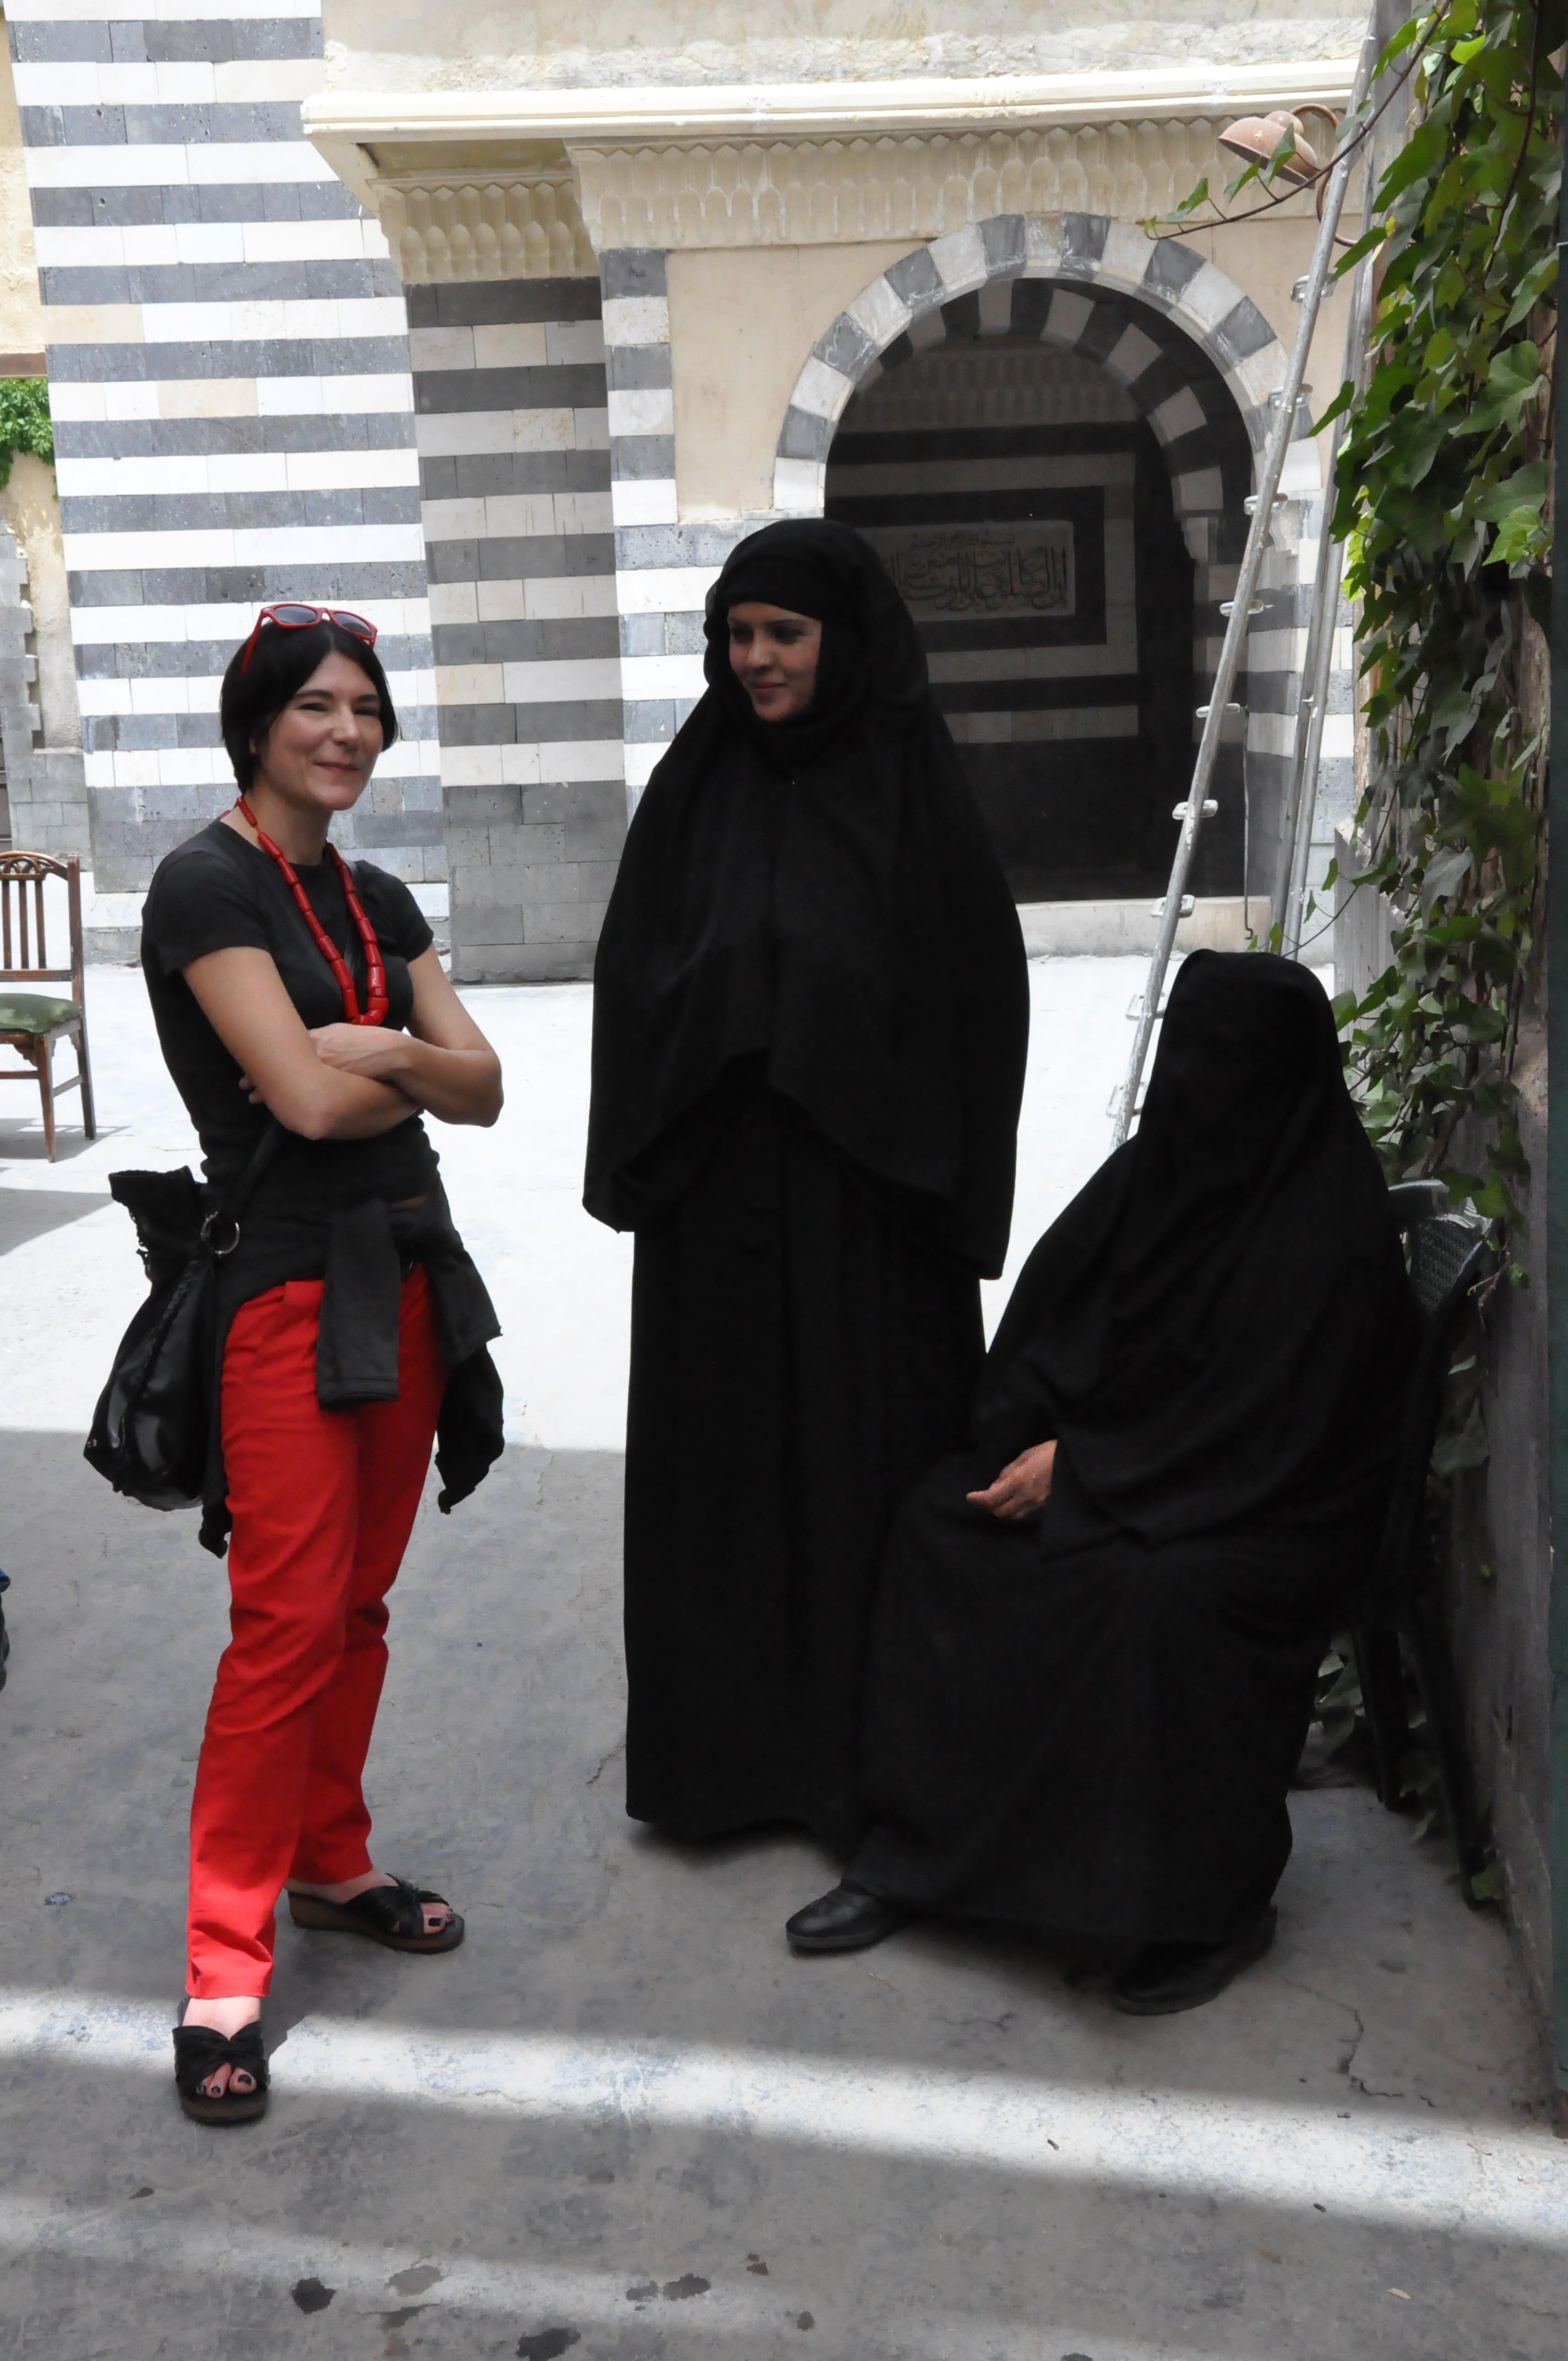 bab al hara season 5 episode 1 full